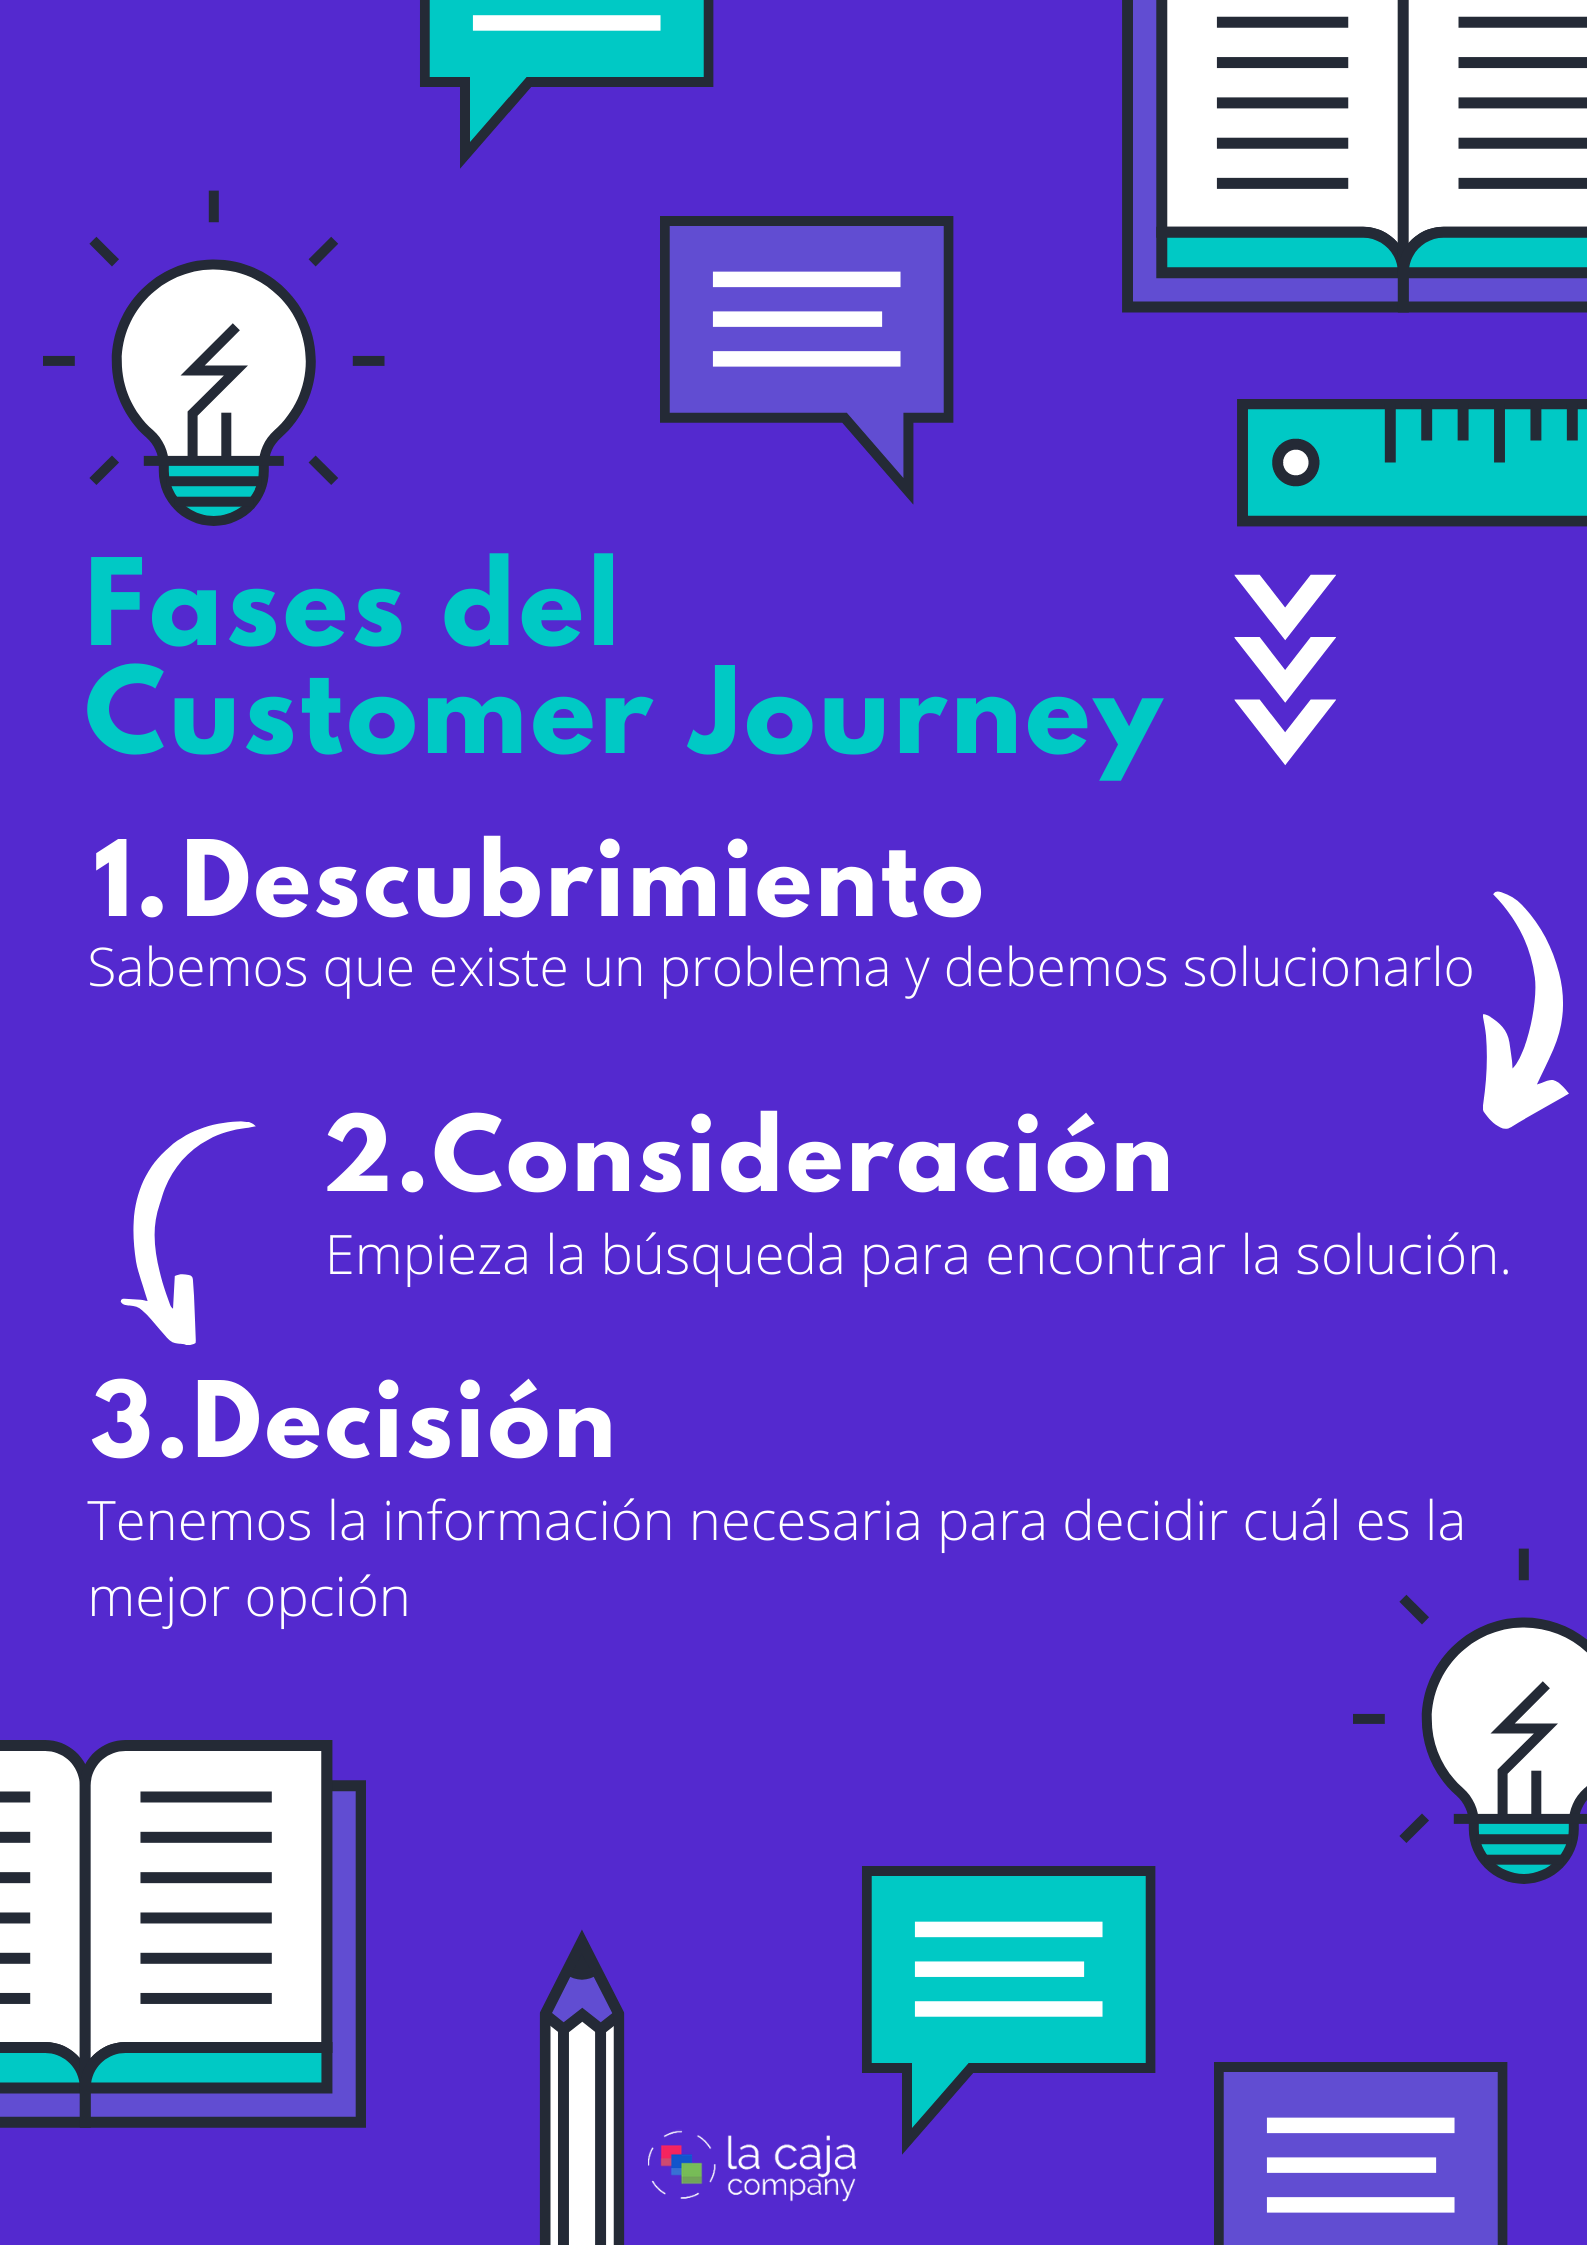 fases customer journey